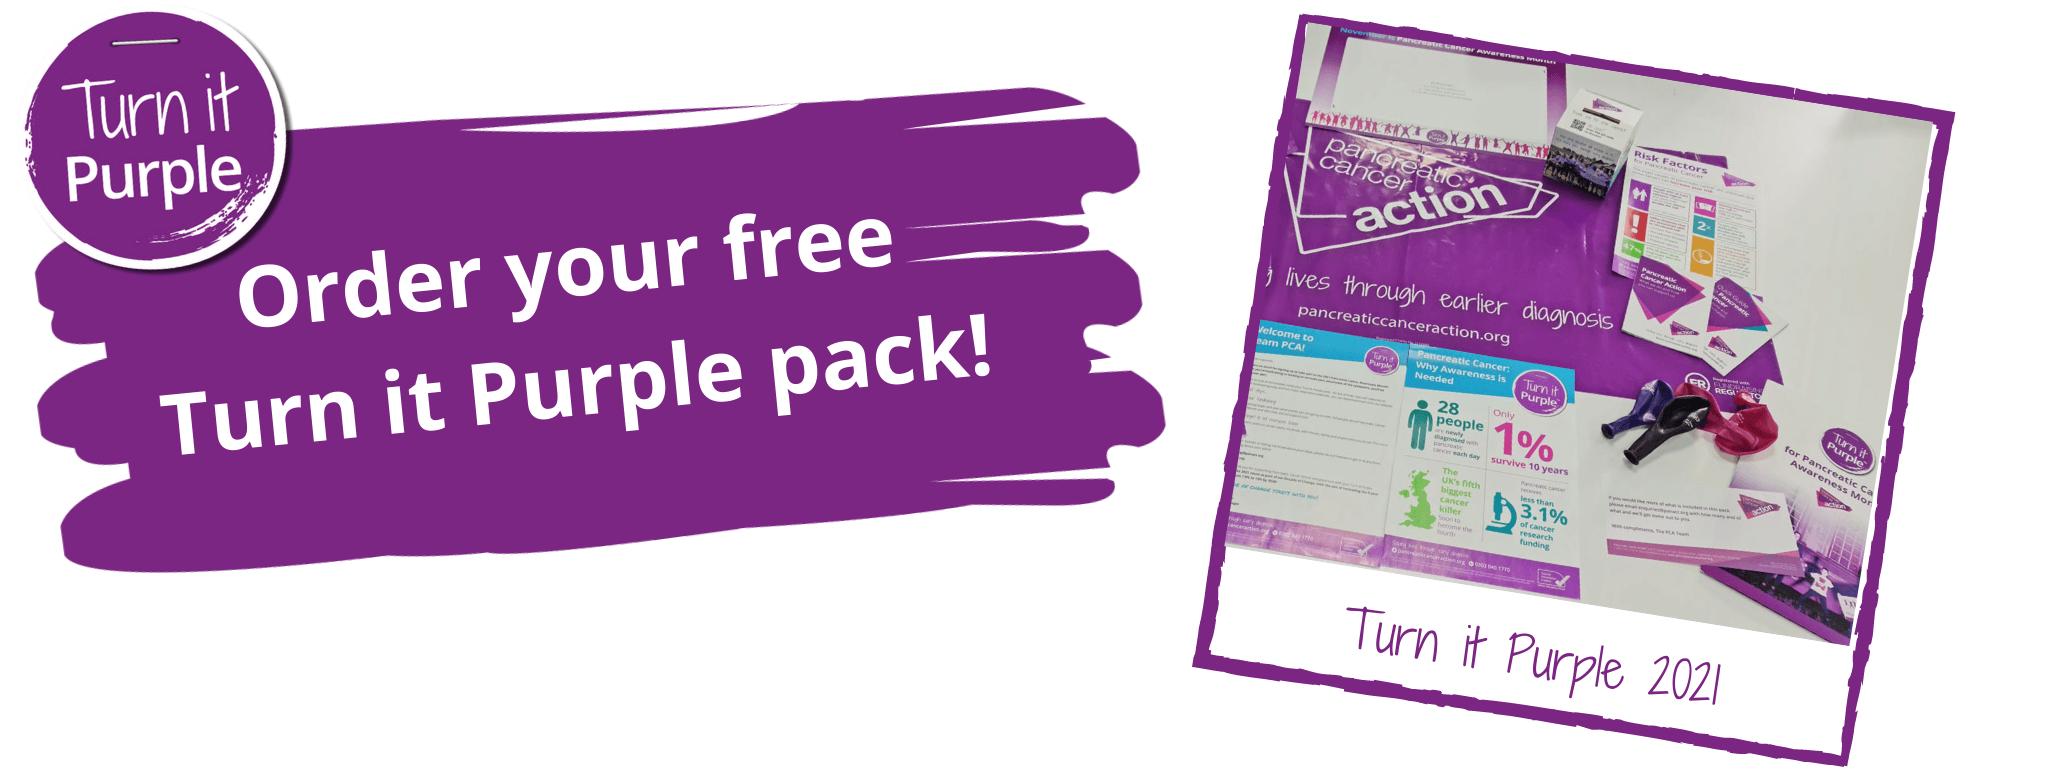 turn it purple pack